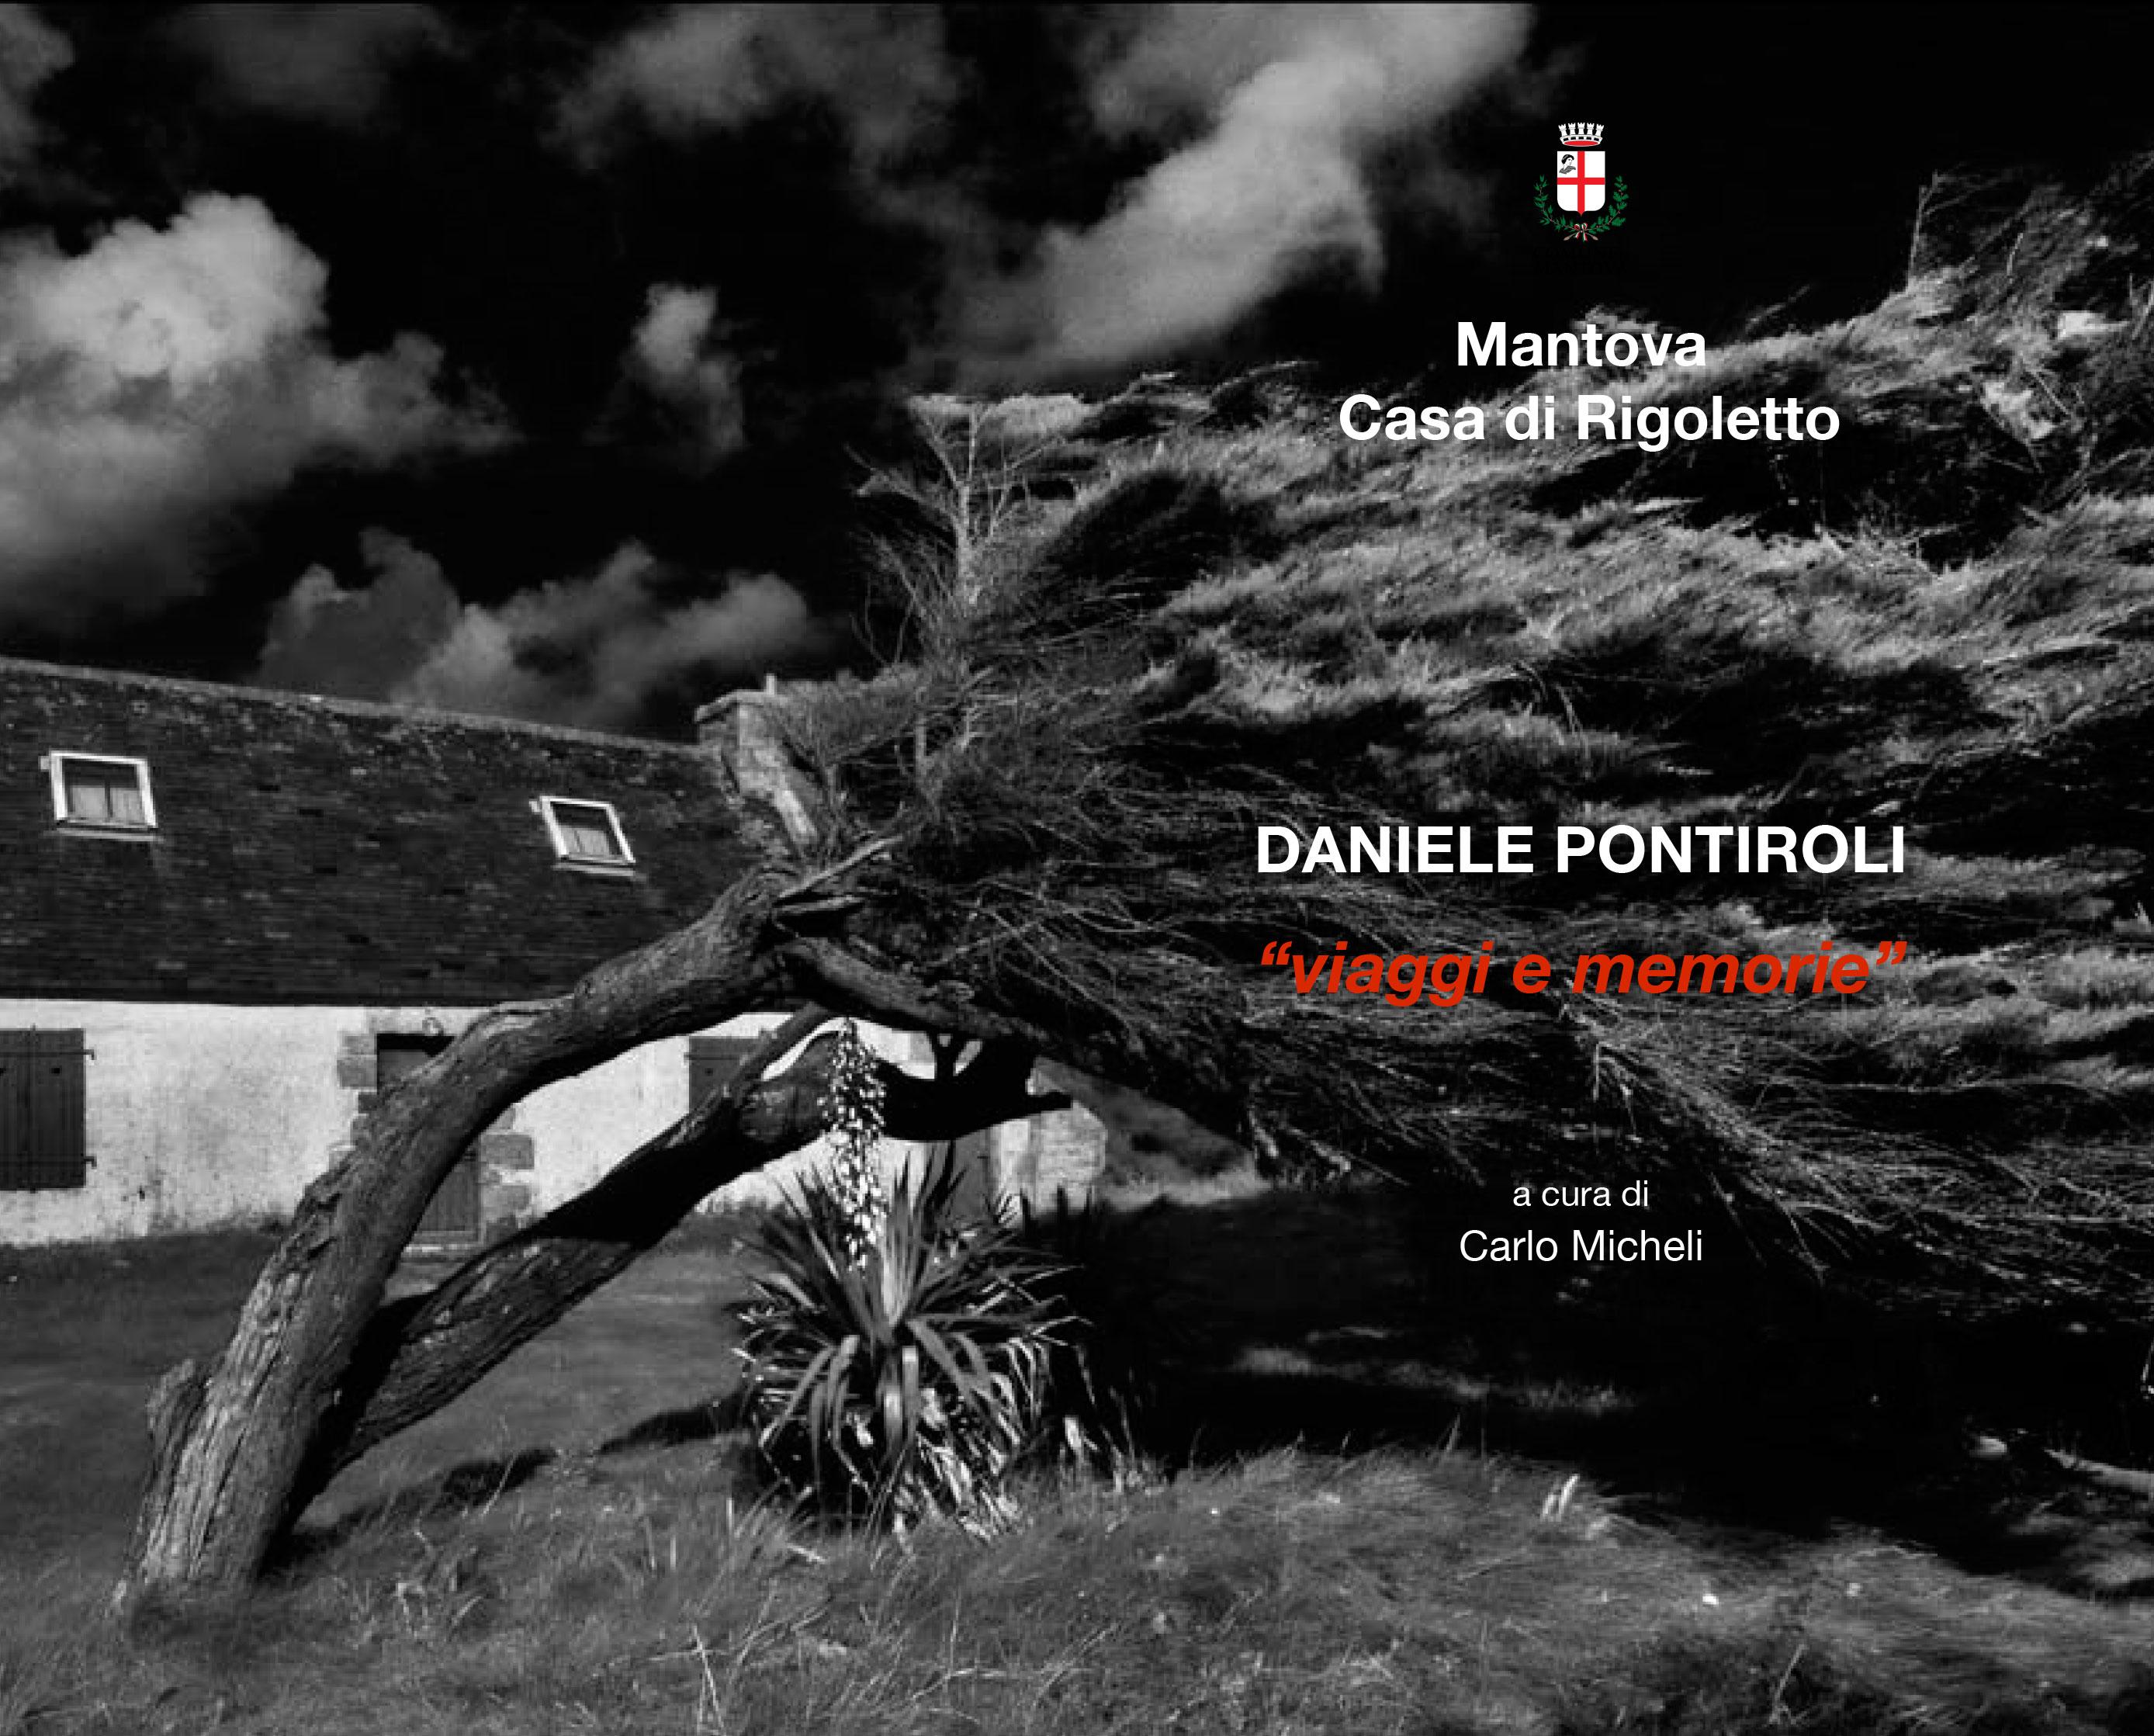 Mostra fotografica VIAGGI E MEMORIE di Daniele Pontiroli